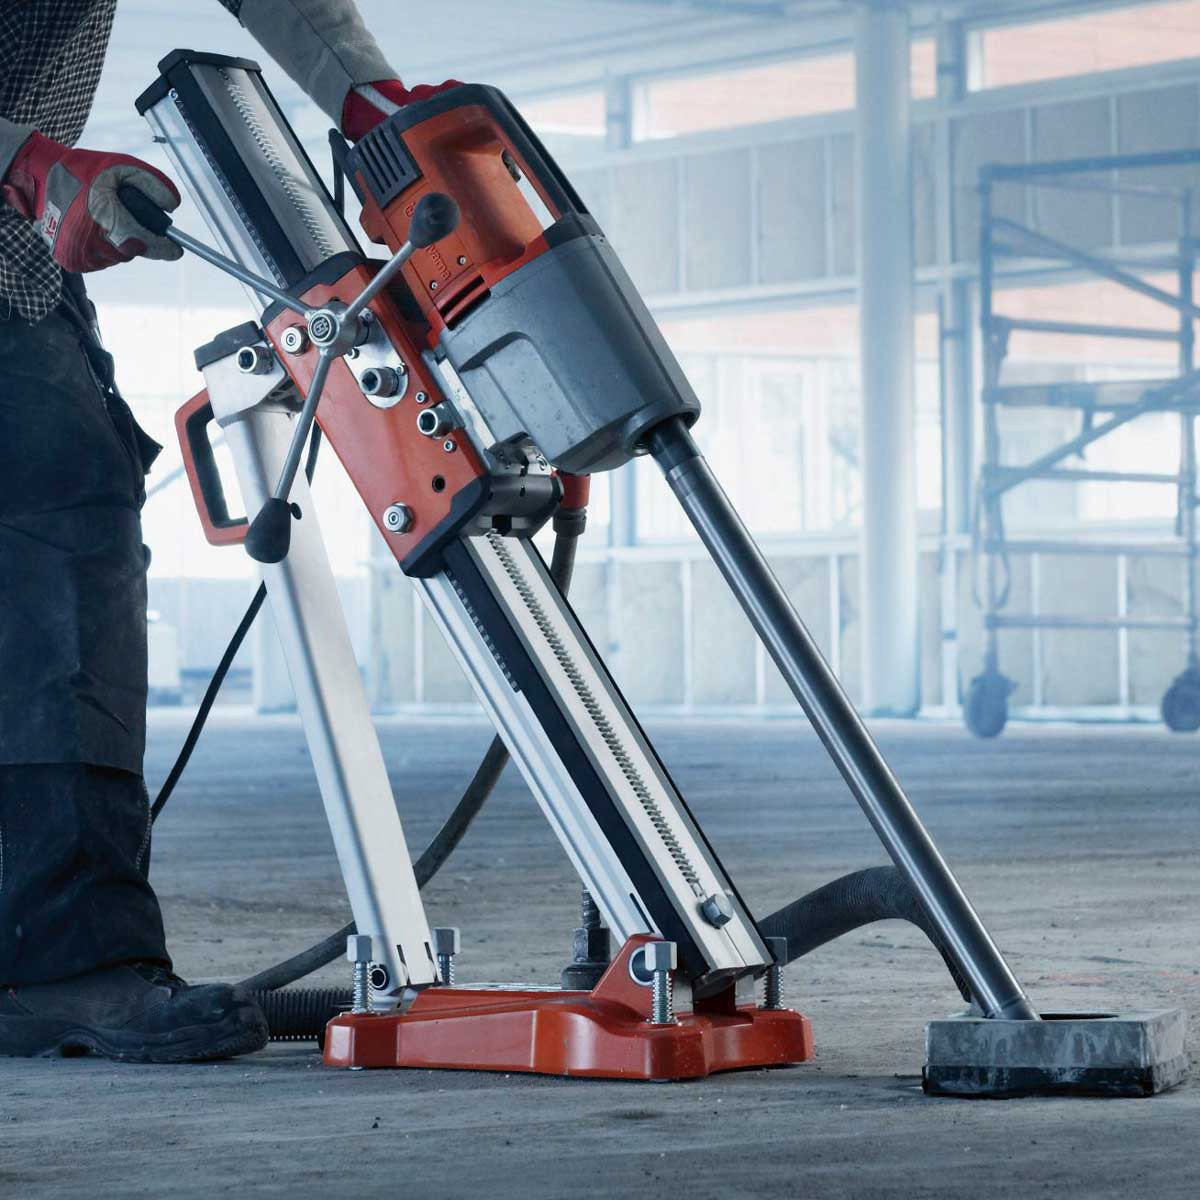 Husqvarna DMS 280 concrete drill